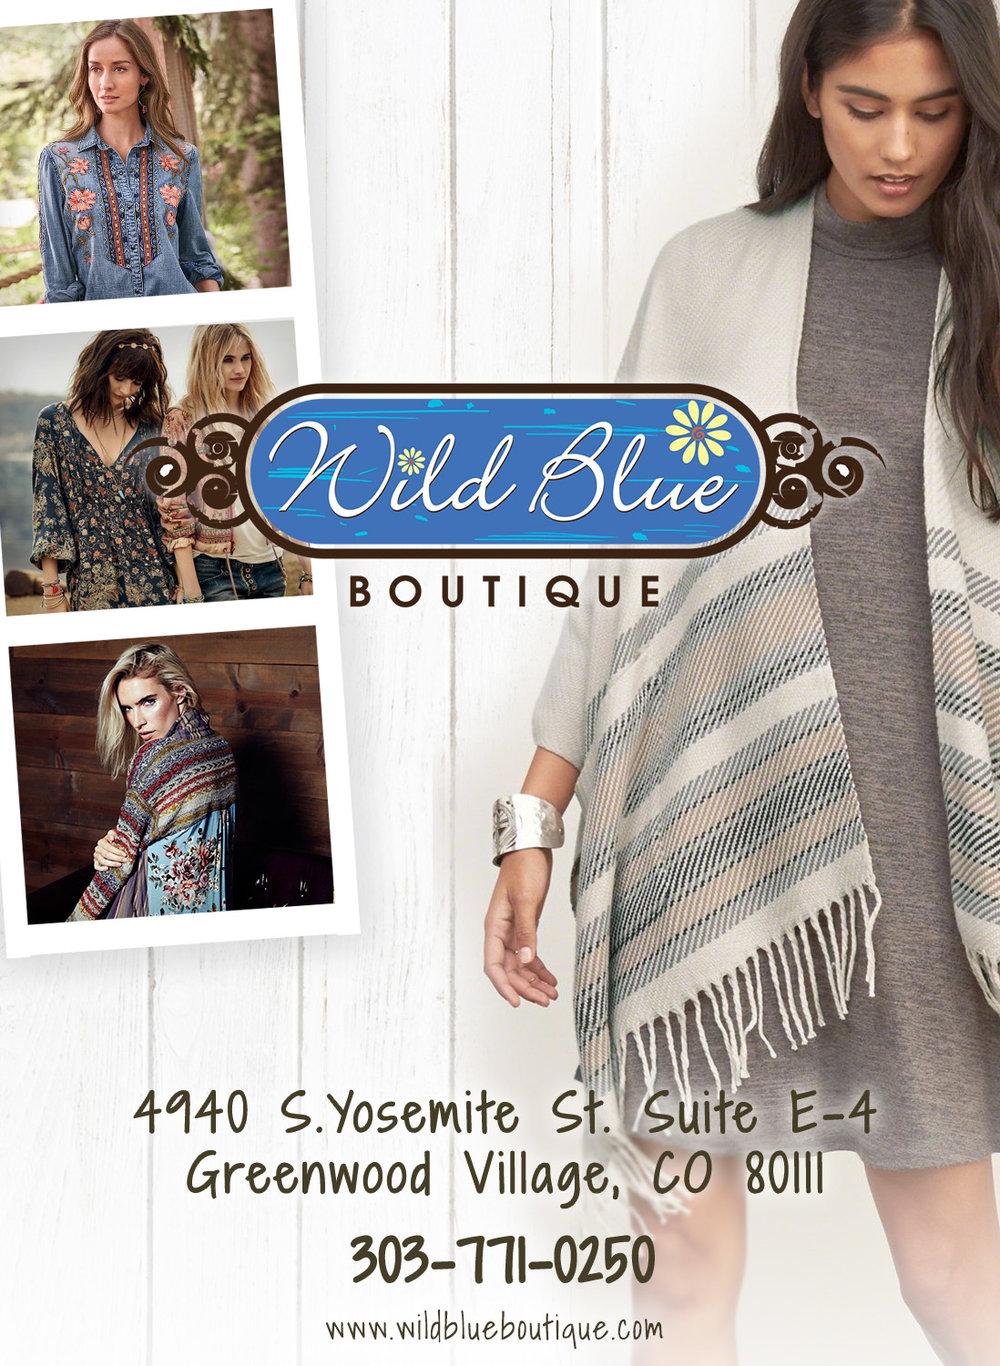 Magazine Ad for Wild Blue Boutique (Denver, CO)